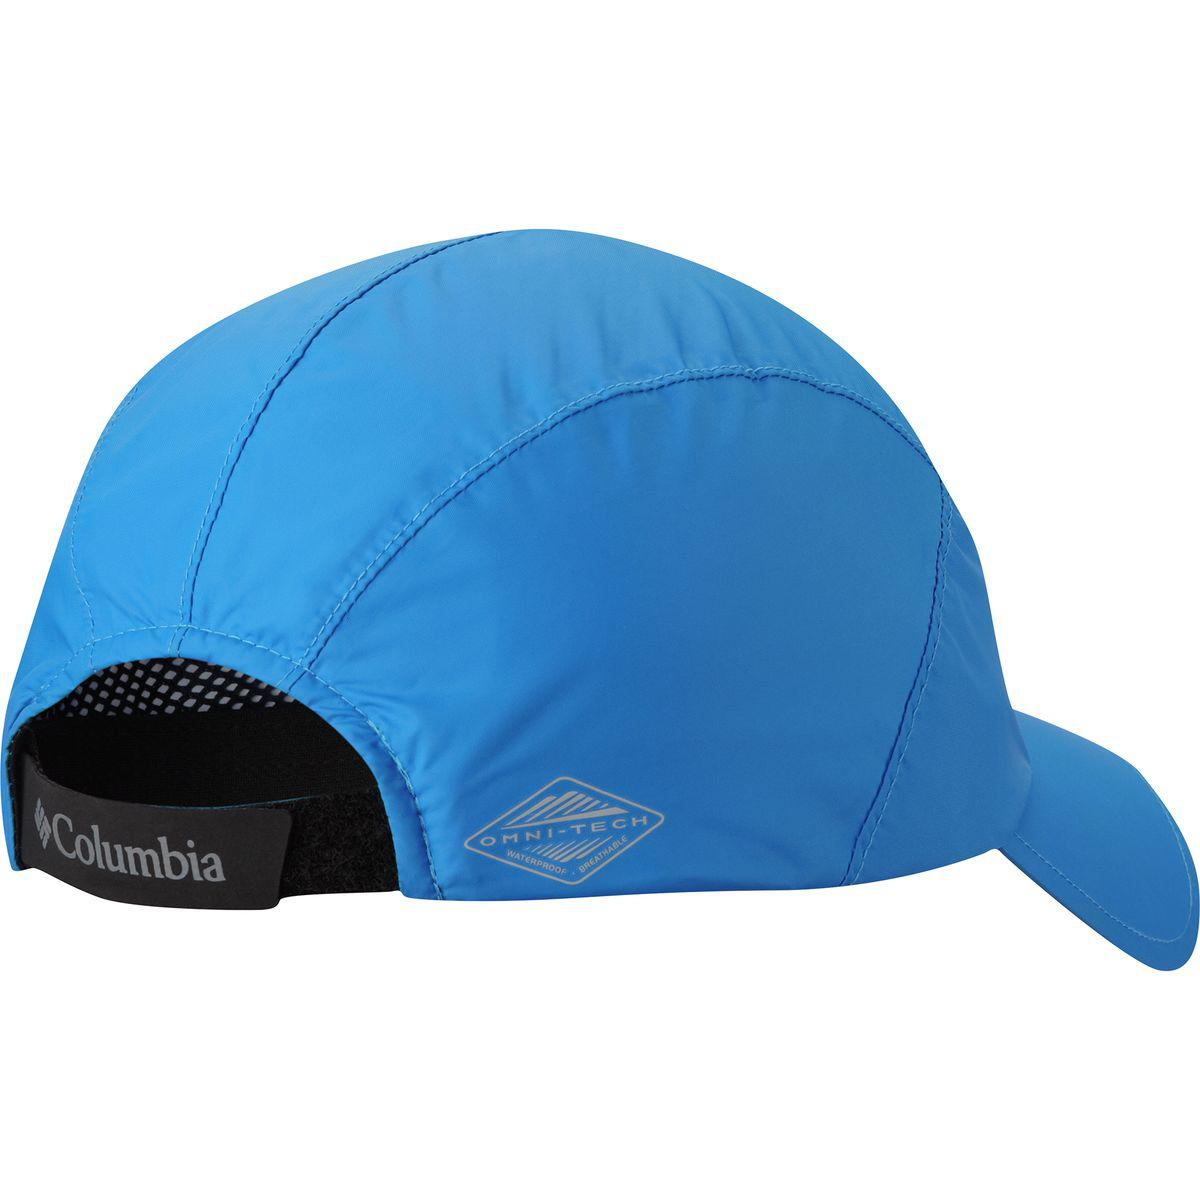 Lyst columbia watertight cap in blue for men jpg 1200x1200 Columbia  watertight cap 52b108fb0e32